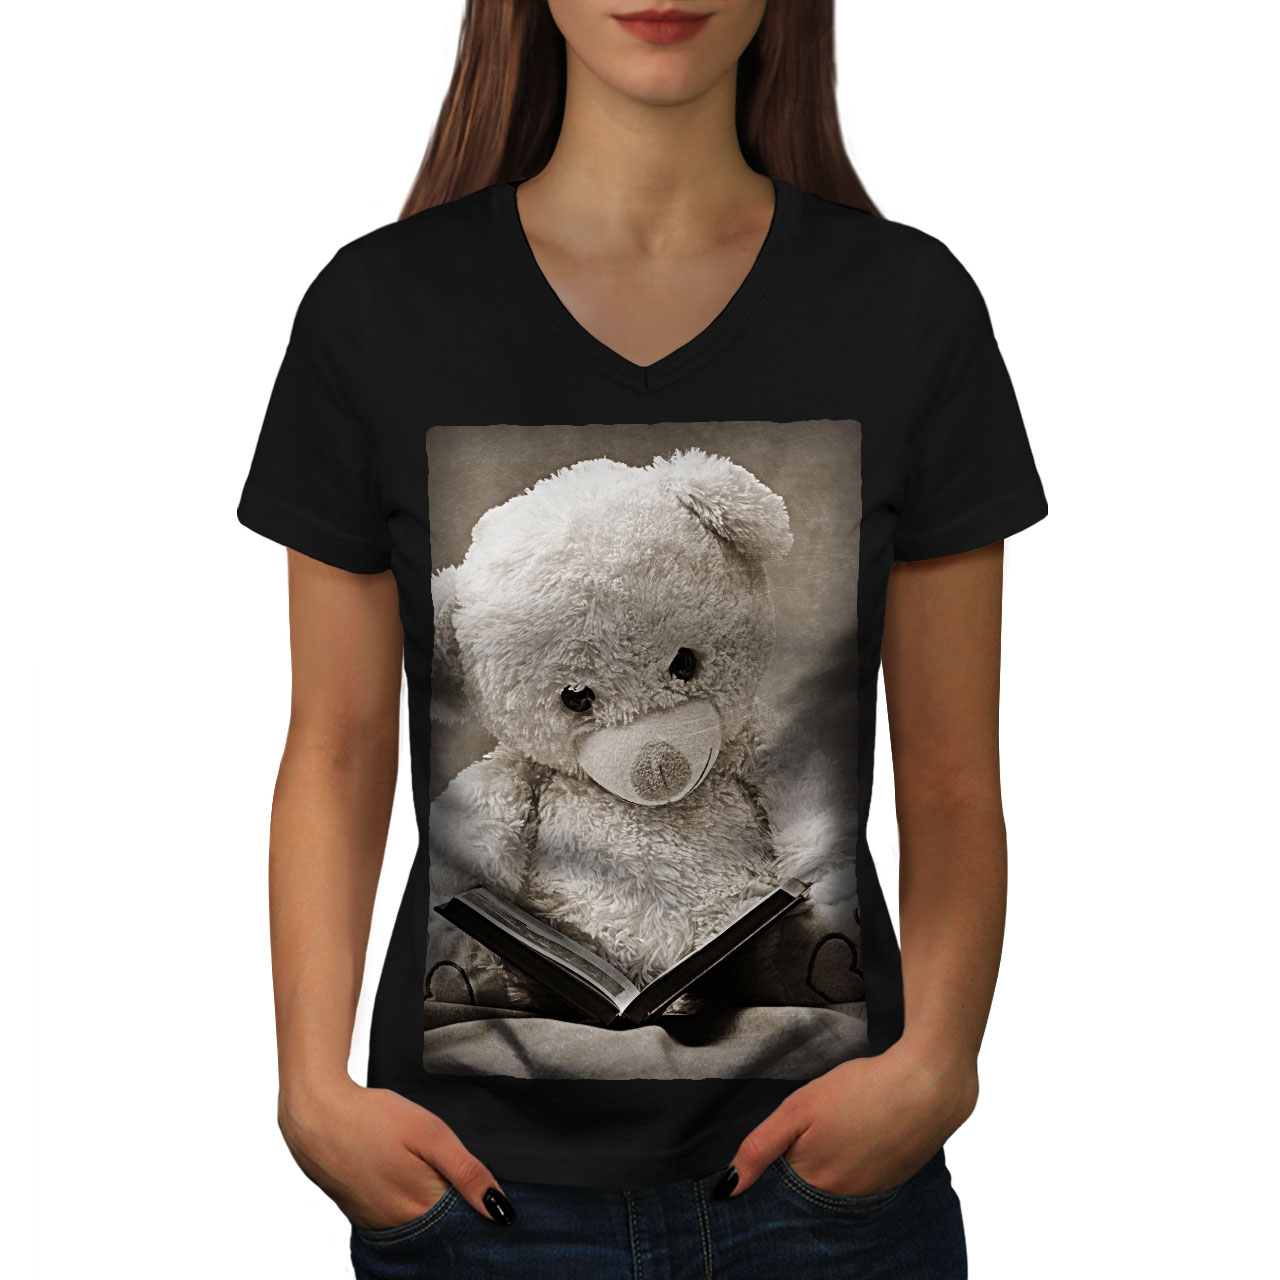 Book Graphic Design Tee Wellcoda Fairytale Teddy Bear Womens V-Neck T-shirt